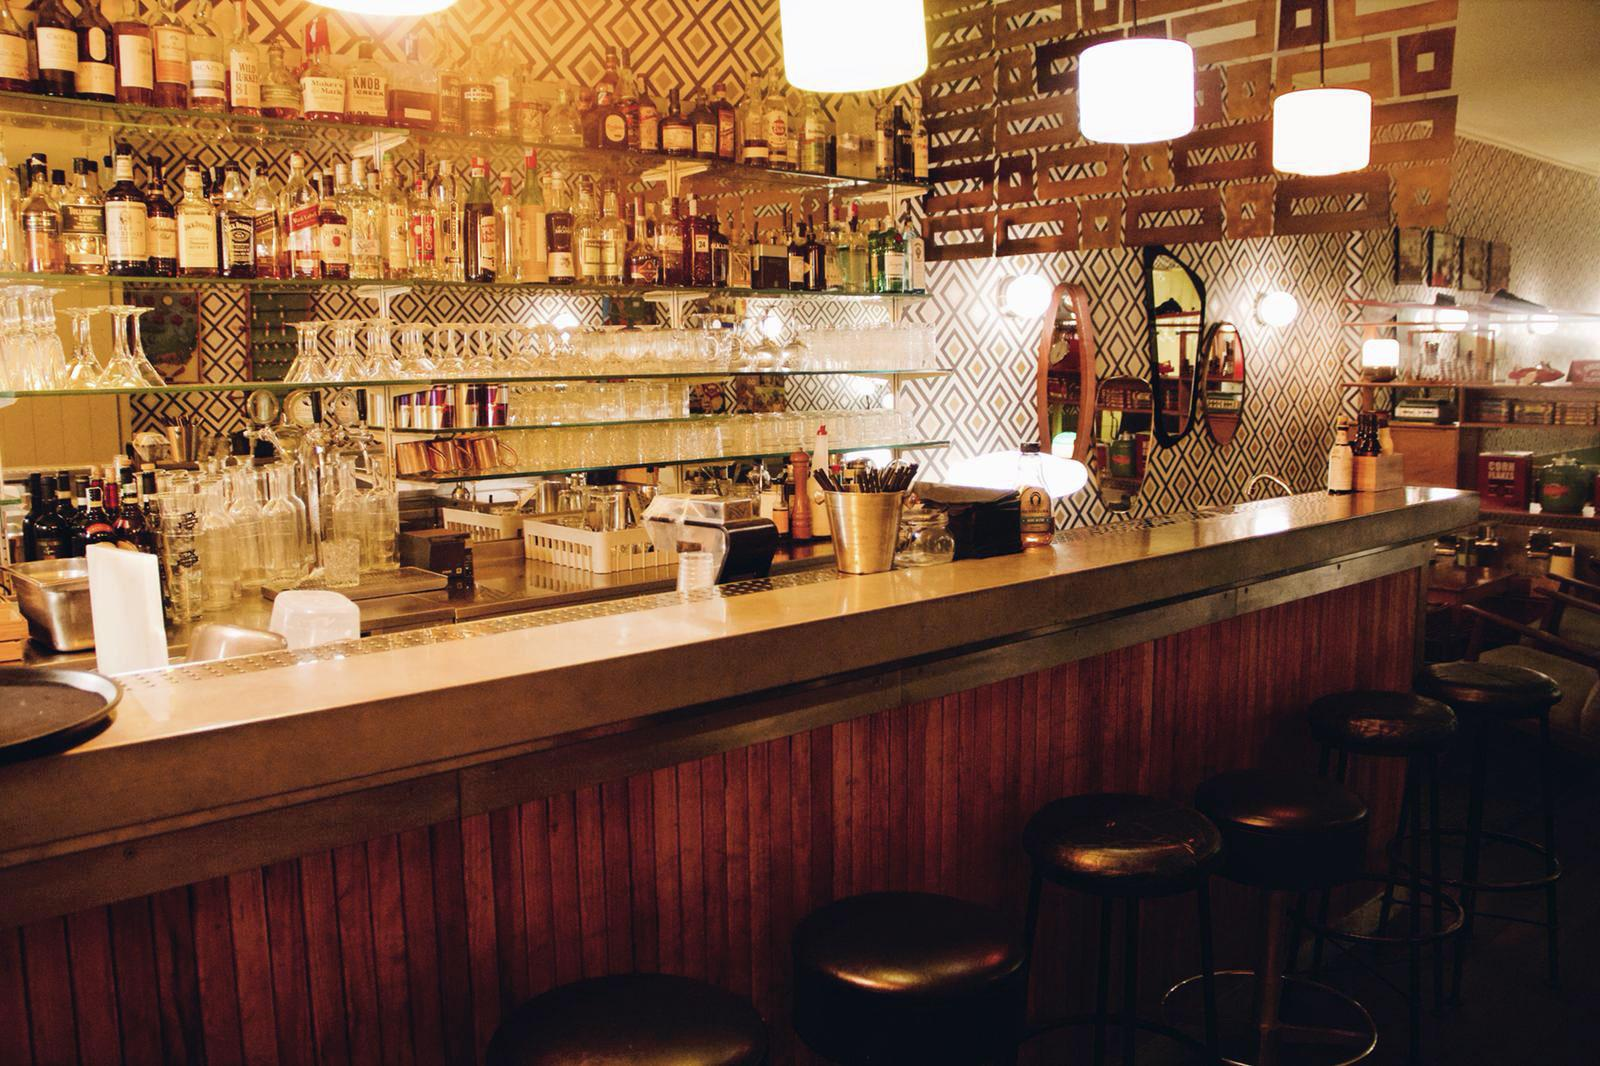 Drogherie Milanesi, Milano, Stile, Mise en Place, Ricette, Ristorante